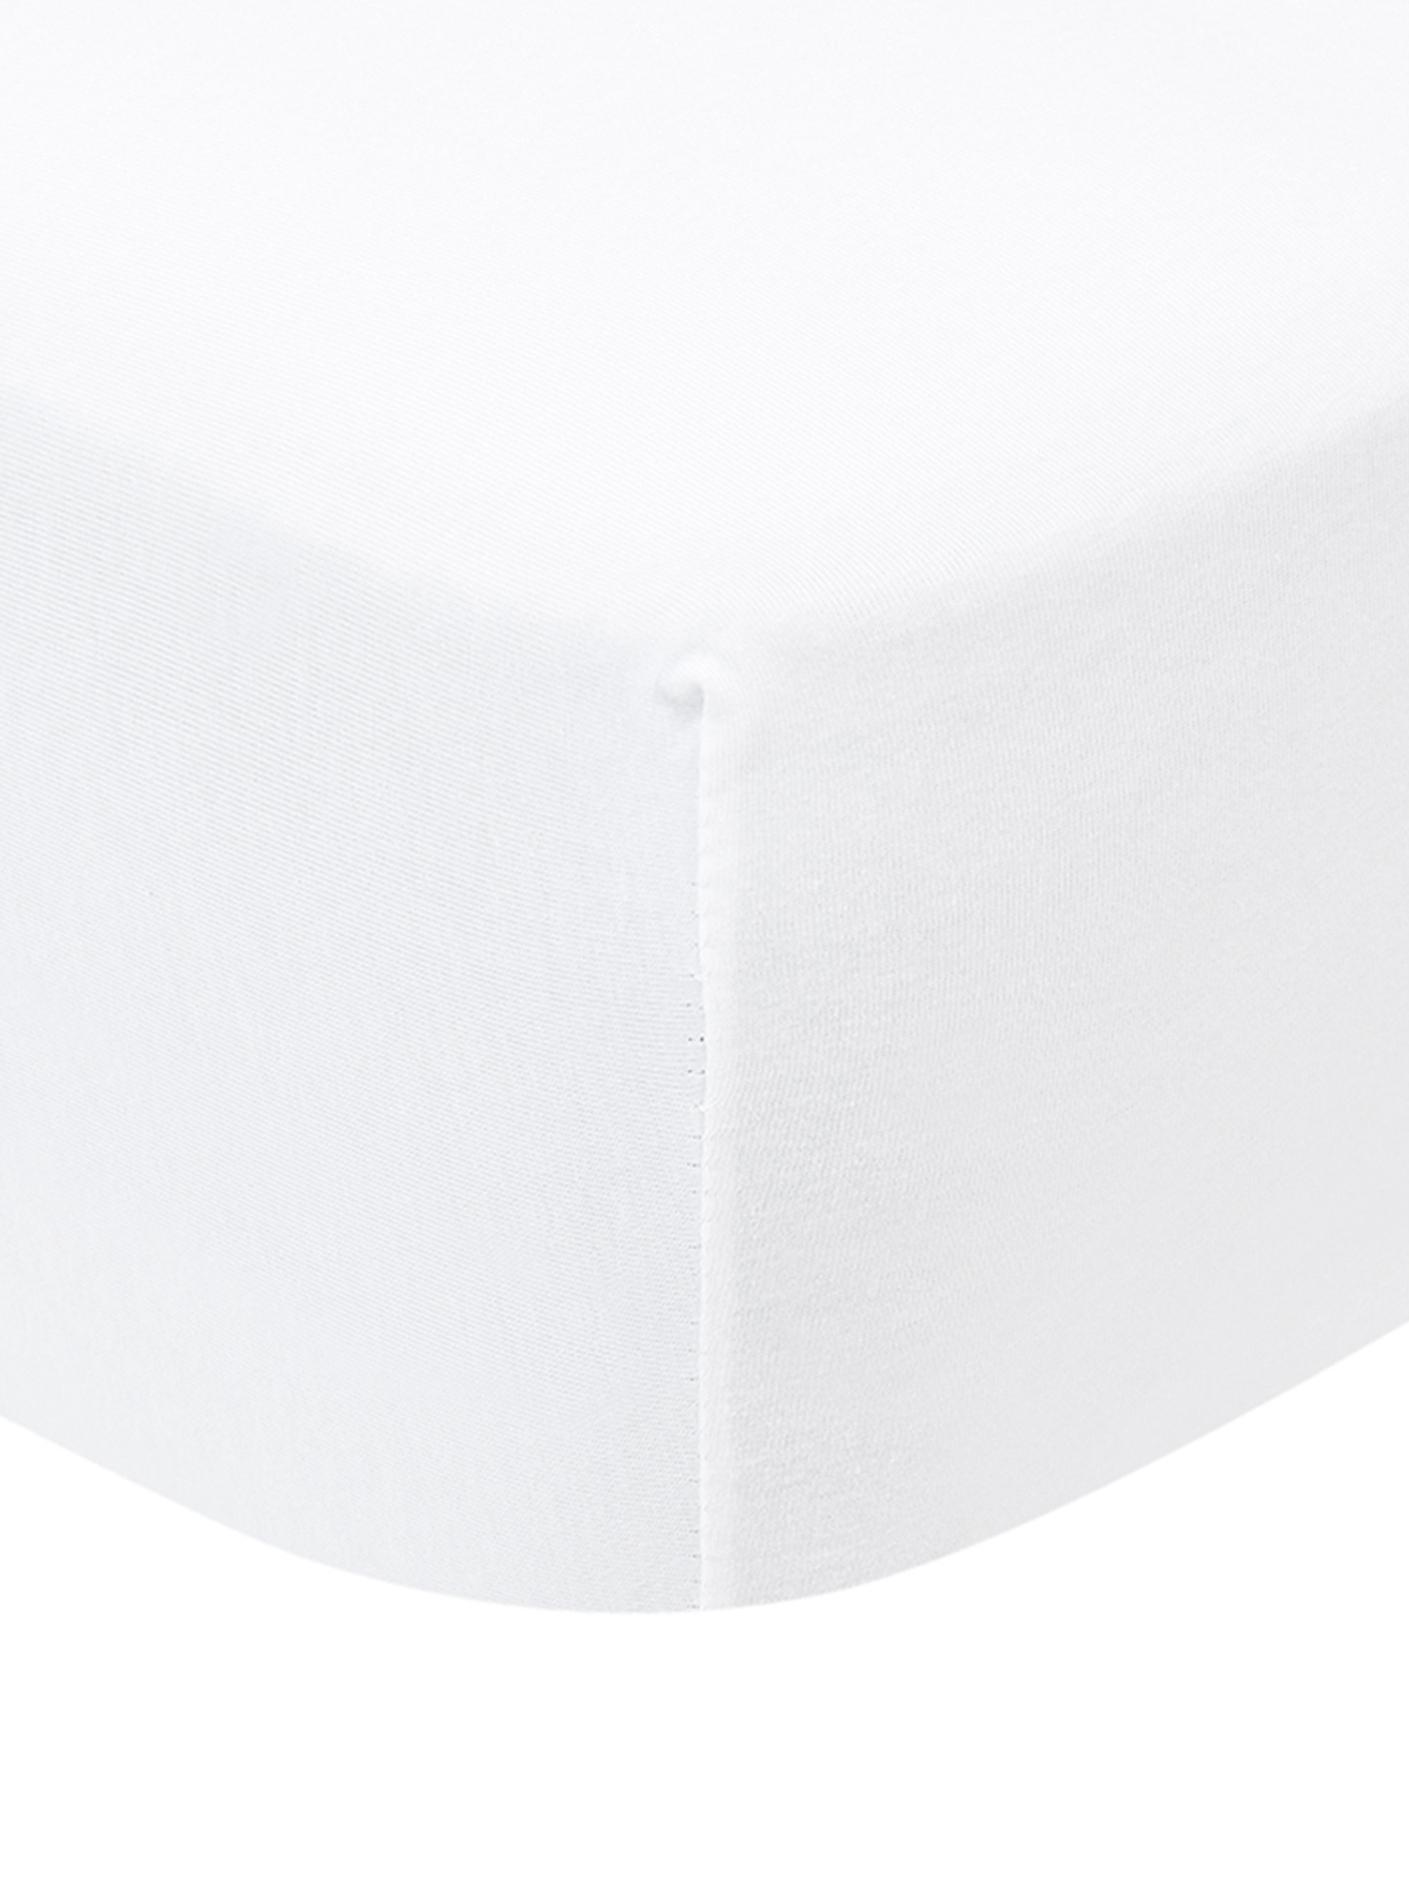 Boxspring-Spannbettlaken Lara, Jersey-Elasthan, 95% Baumwolle, 5% Elasthan, Weiß, 140 x 200 cm